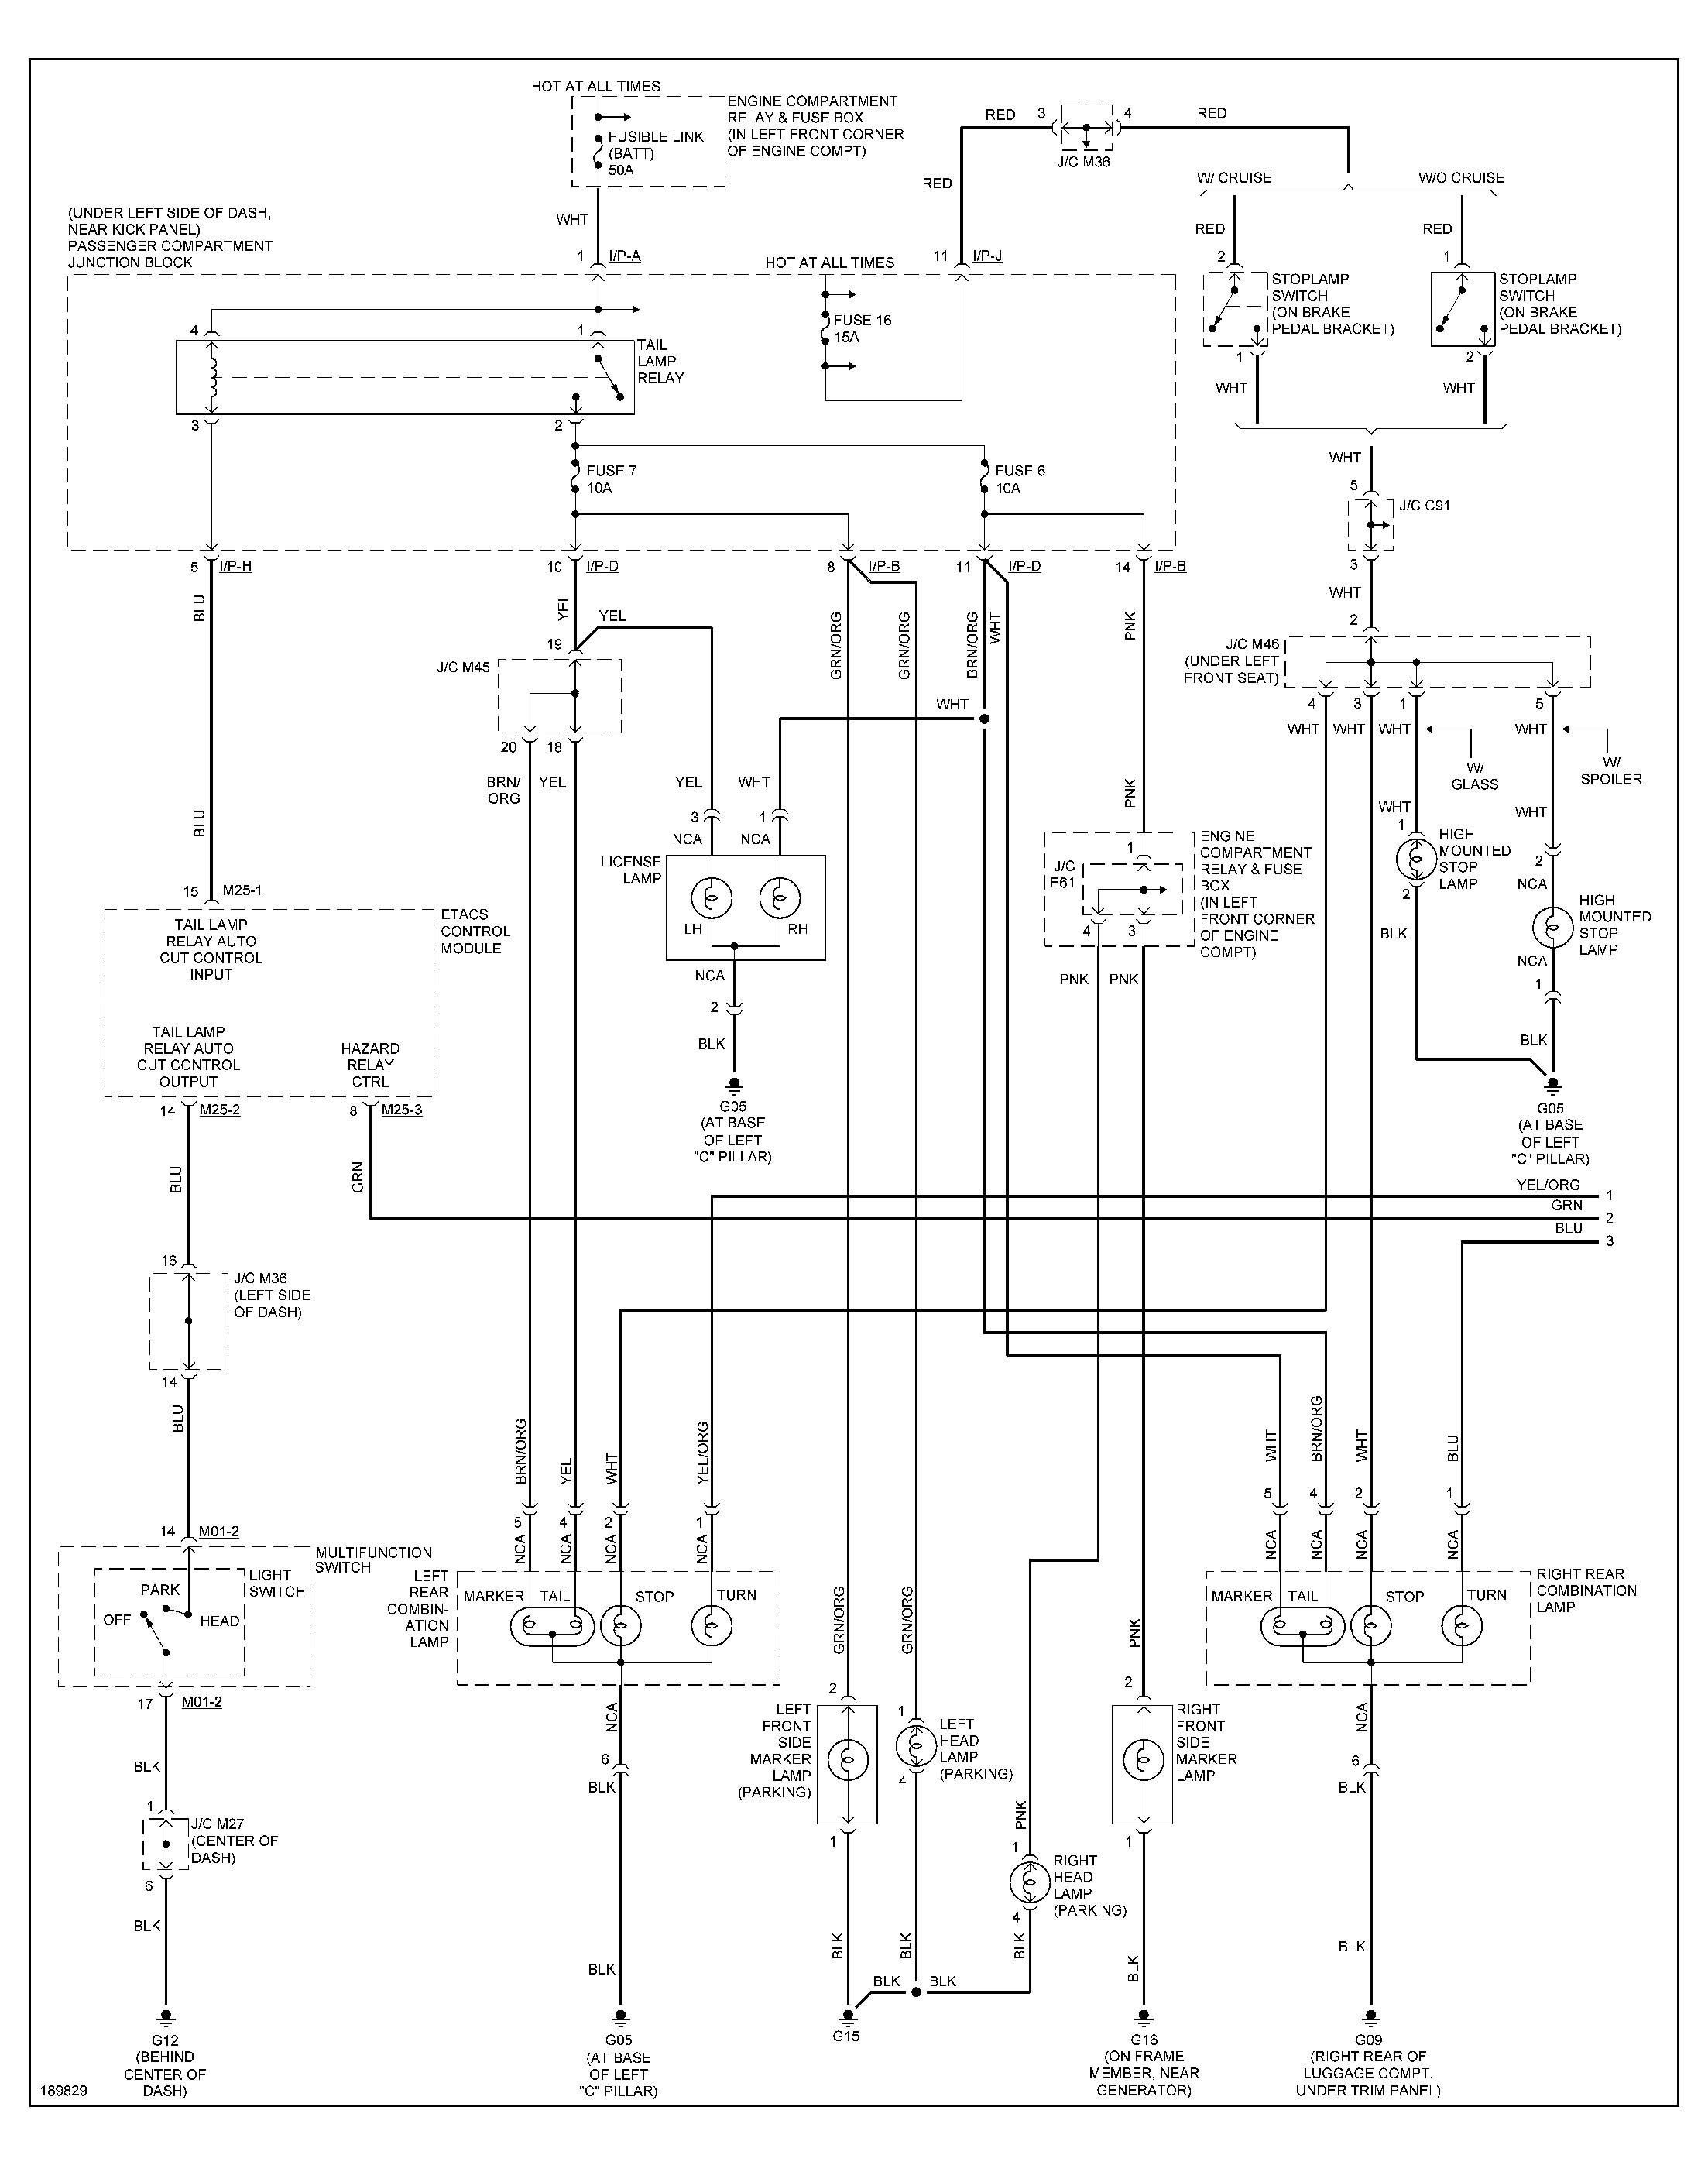 Metra 70 5520 Wiring Diagram Electronics Awesome Image Buick